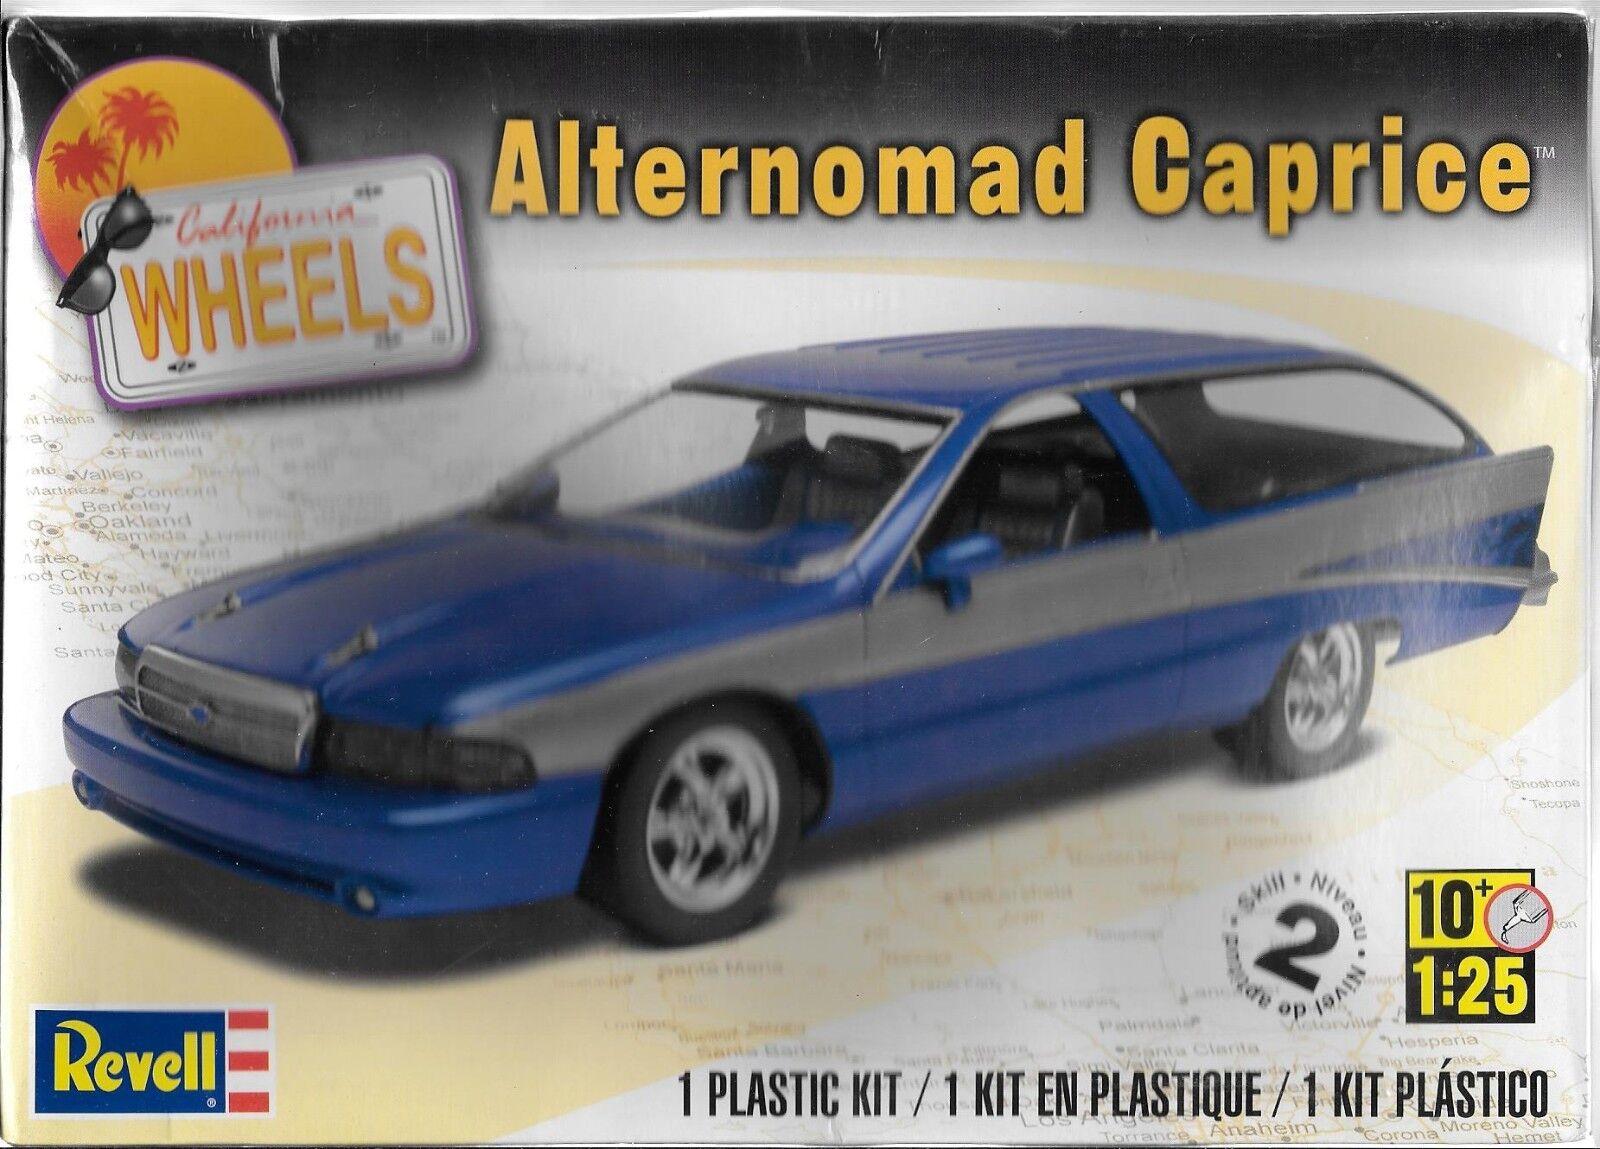 Revell 'California Wheels' Alternomad Caprice in 1 25 4049